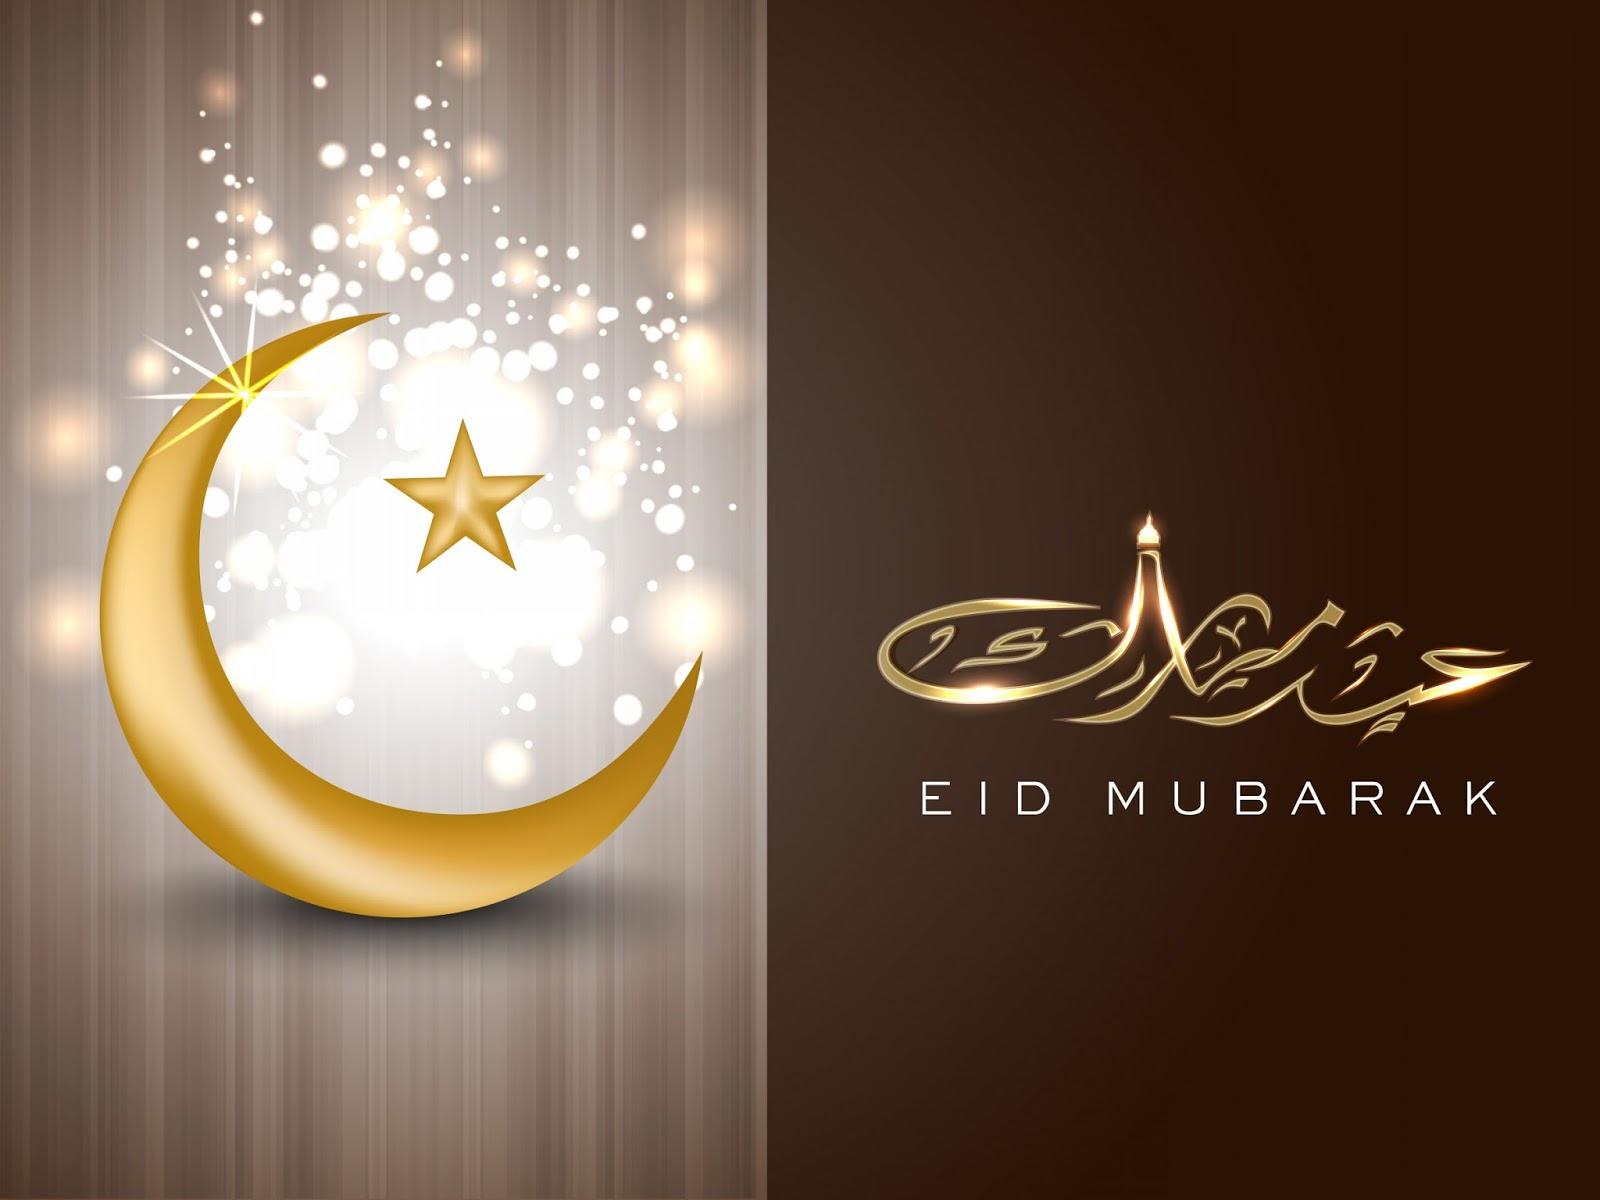 Eid Mubarak {*2018*} Images HD Free Download for Facebook